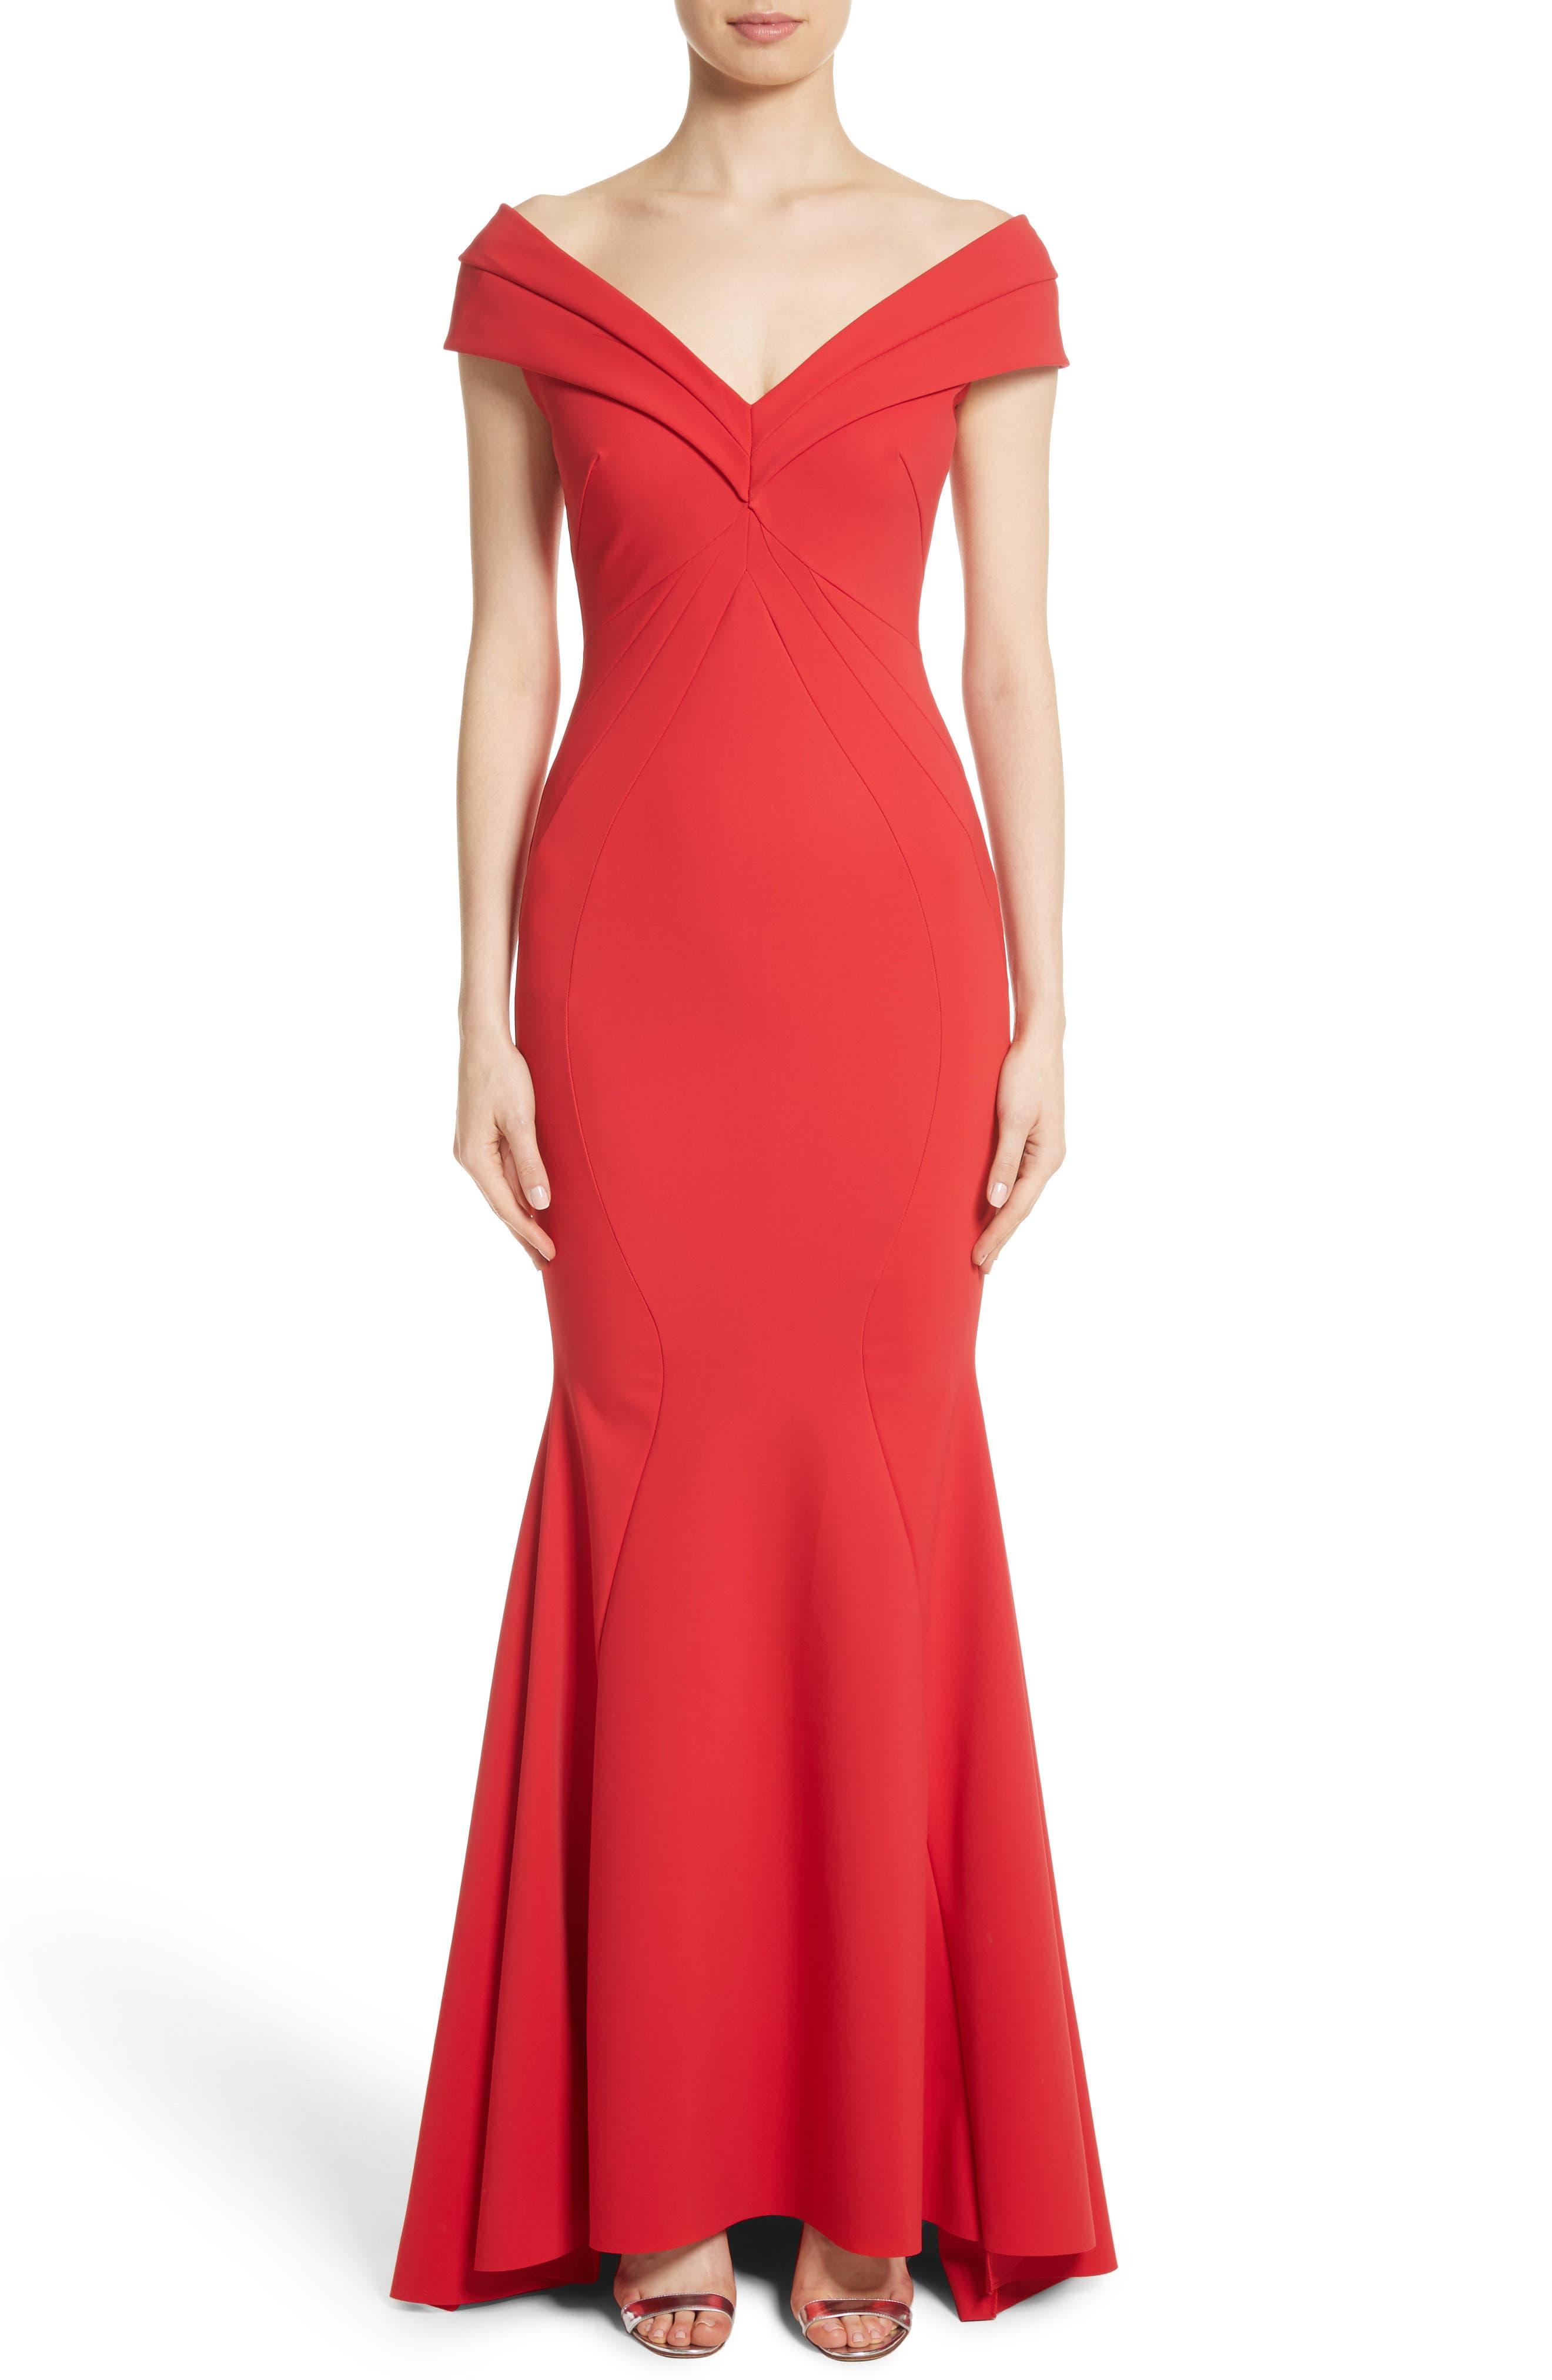 Chiara Boni La Petite Robe Tally Off The Shoulder Trumpet Gown, US / 42 IT - Red